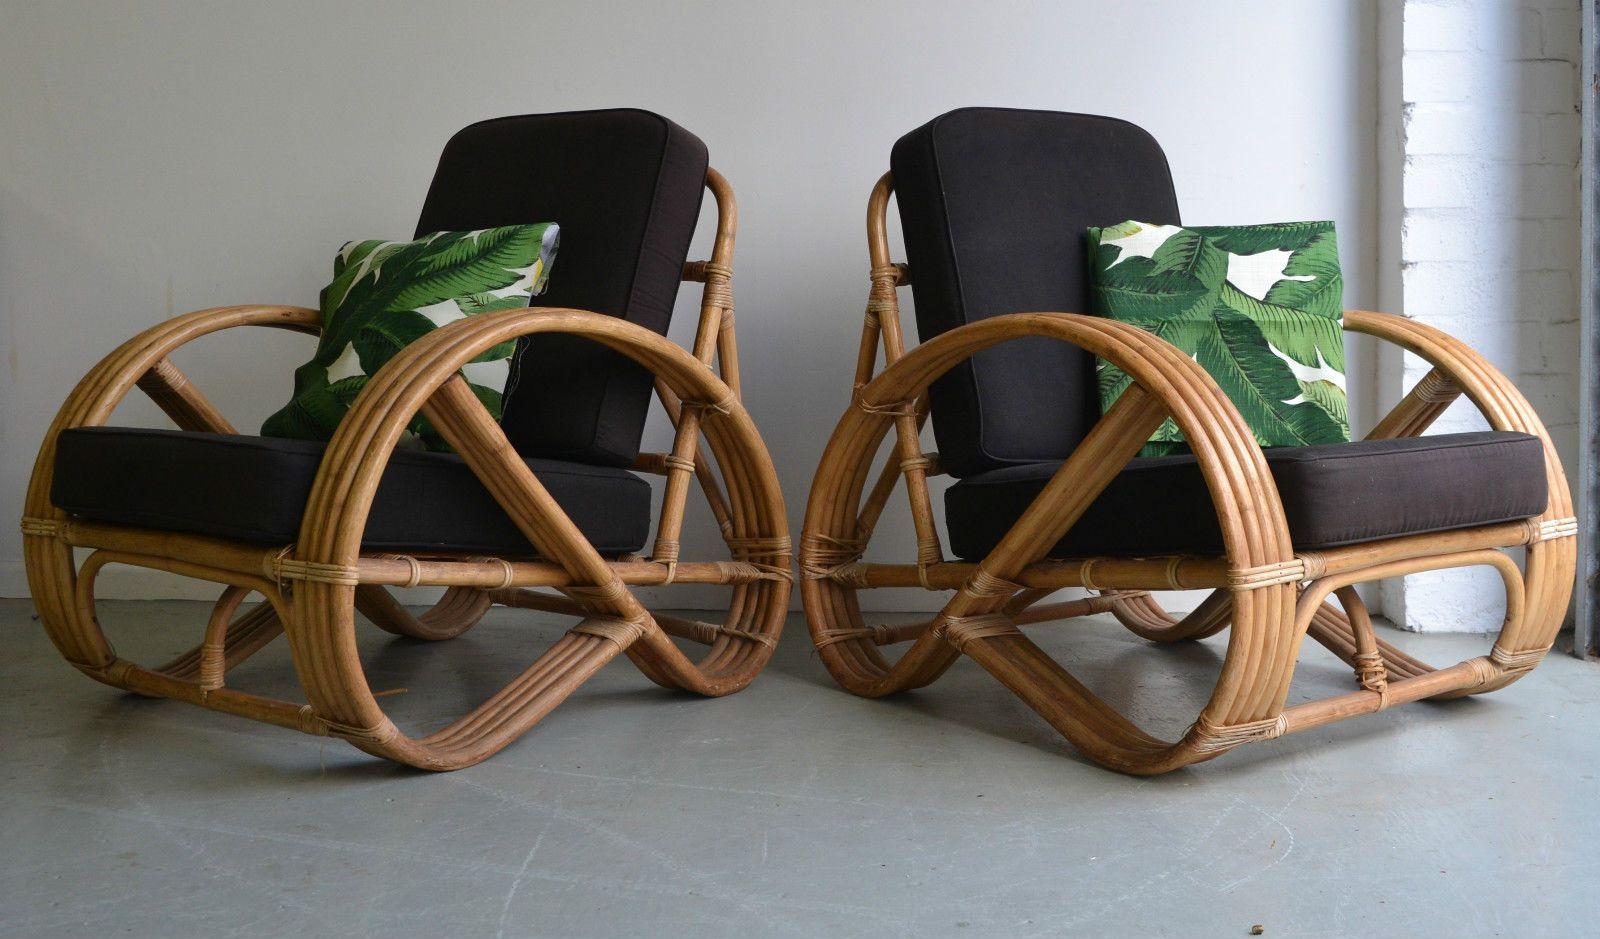 Retro Vintage Manila Cane Bamboo Armchairs X 2 Pretzel Chair Boho Beachouse Cane Outdoor Furniture Rattan Garden Furniture Vintage Chairs